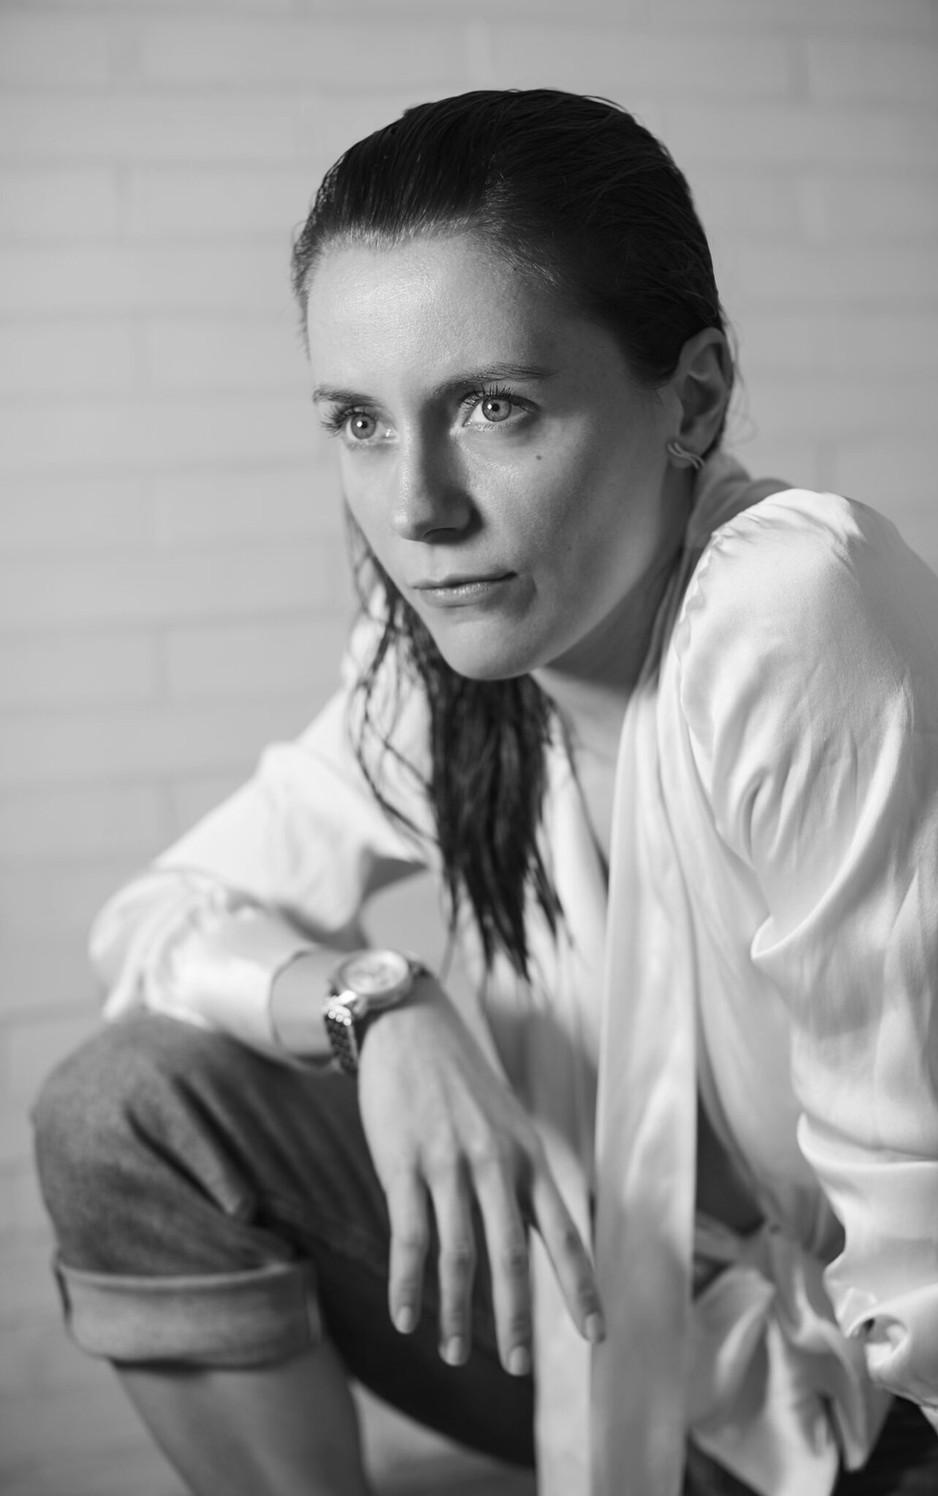 @ Sylvie Castioni